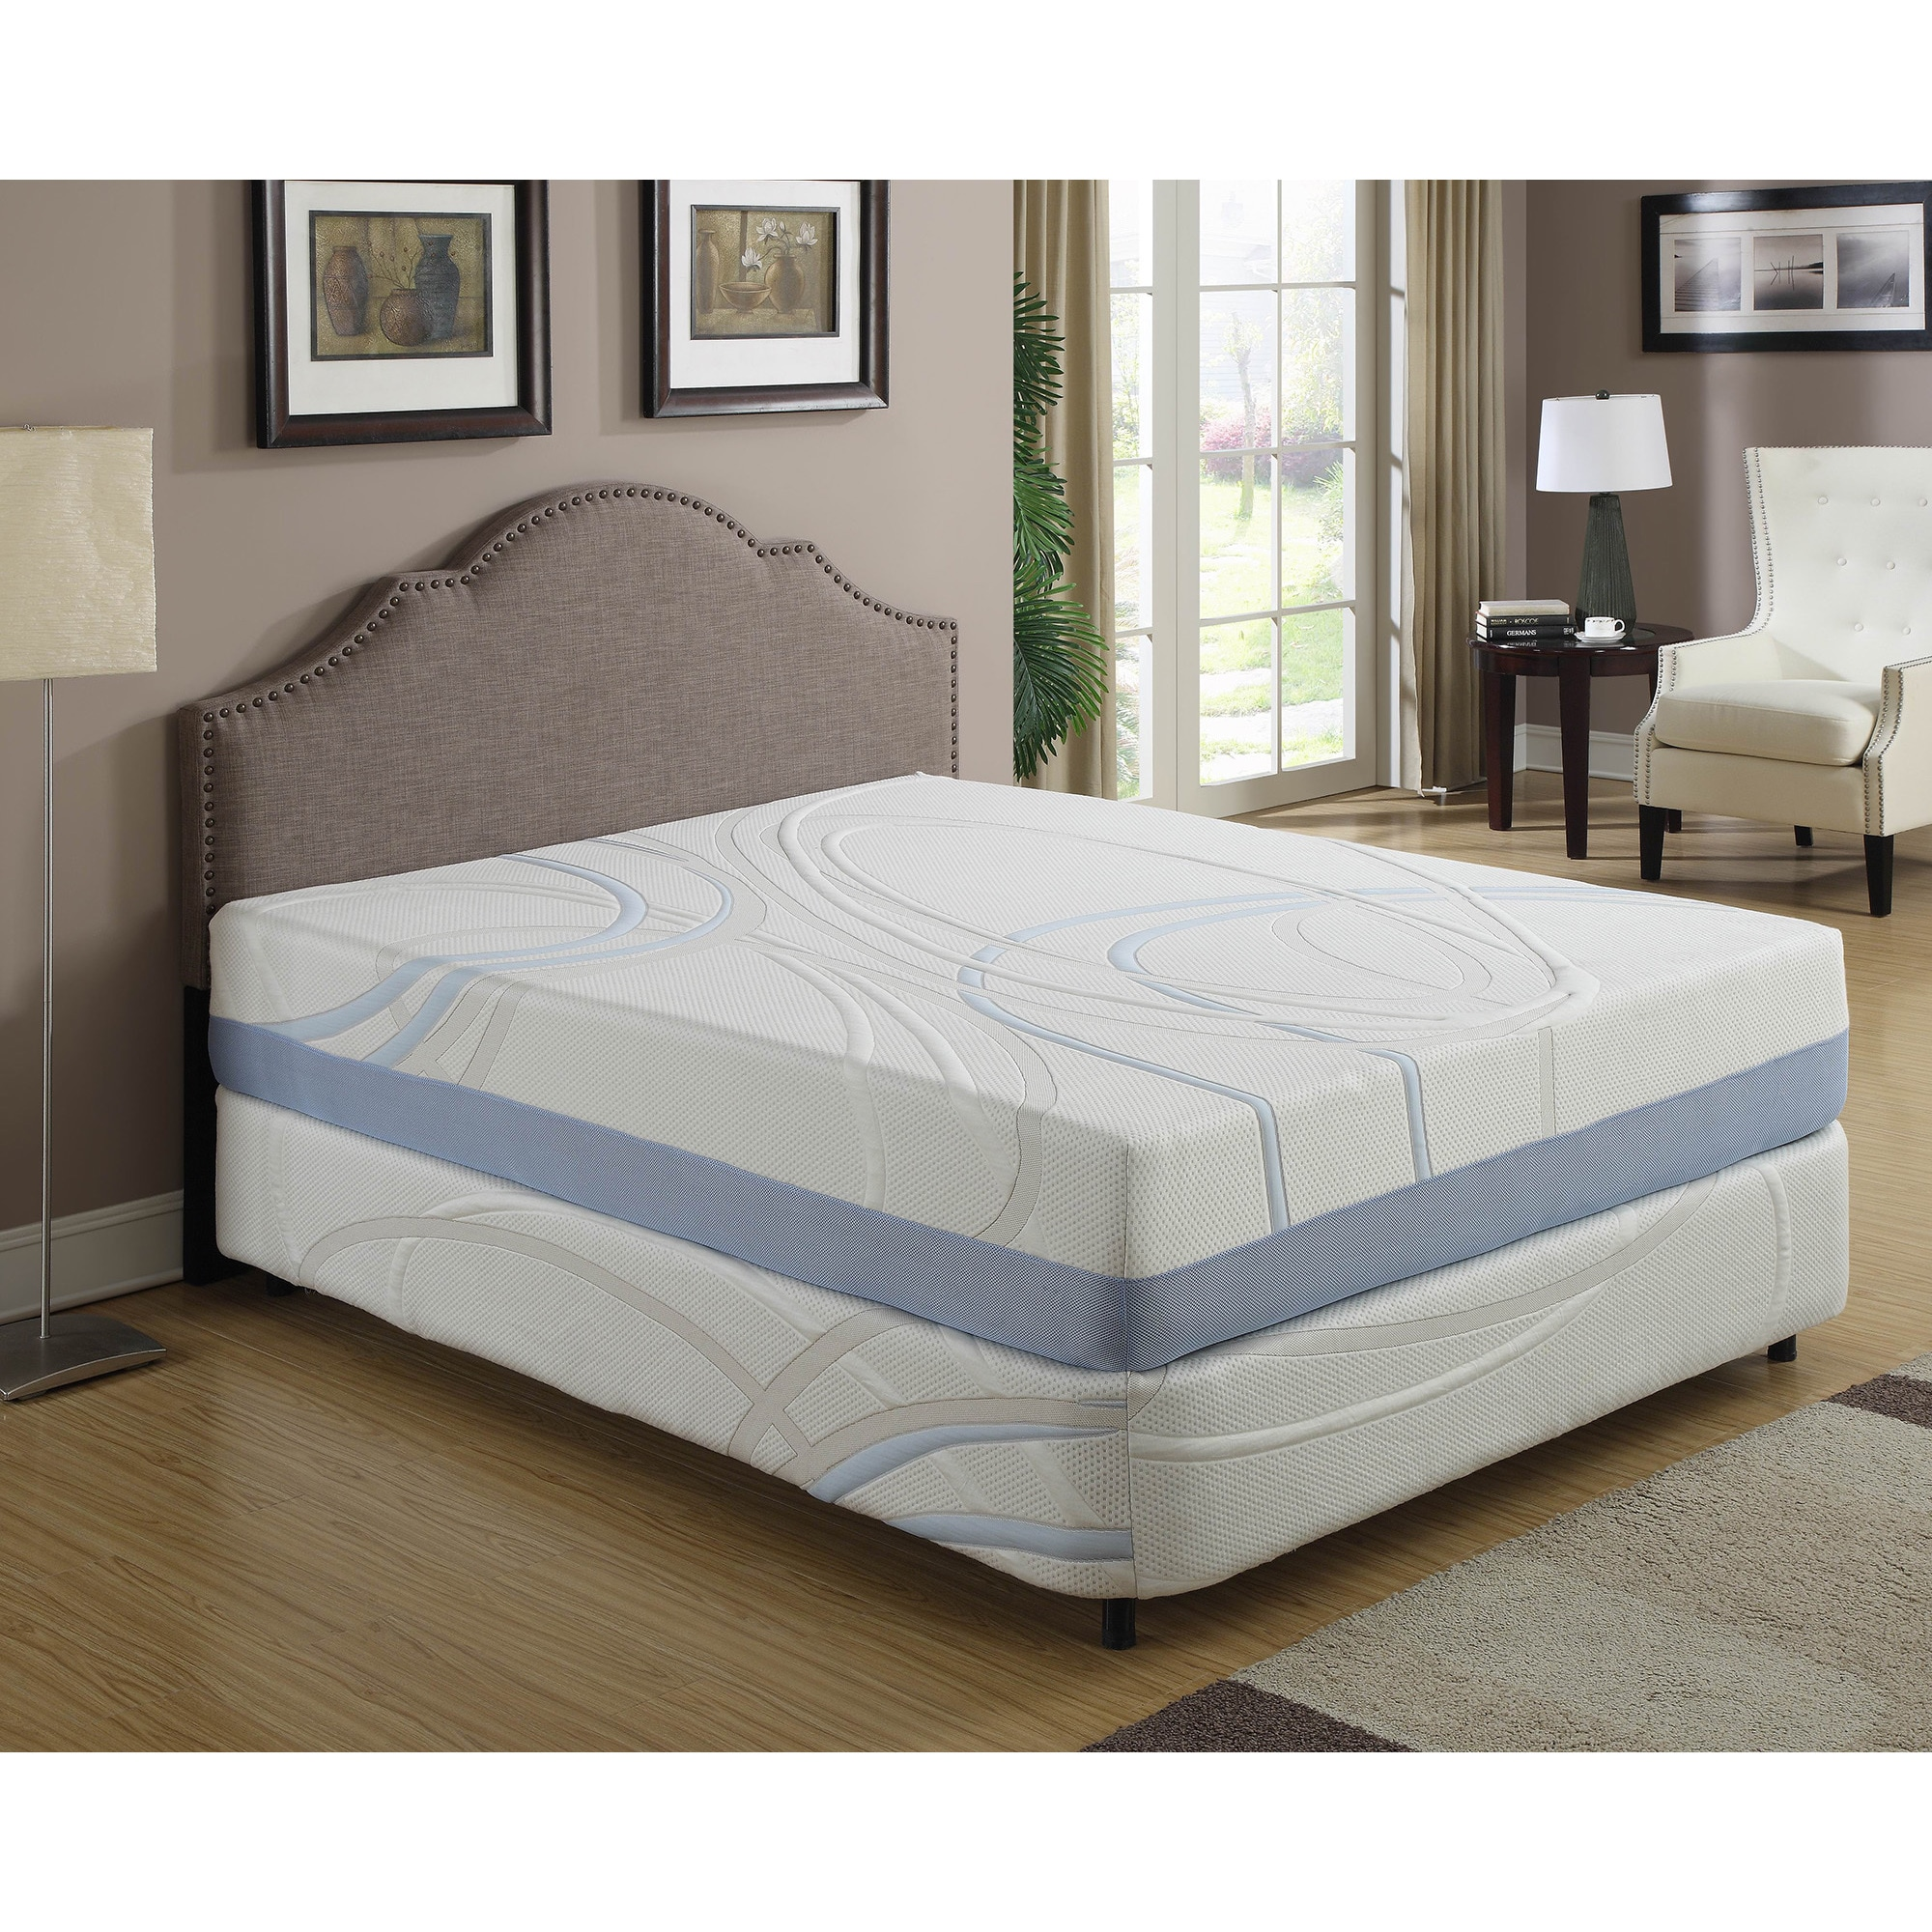 royal mattress jysk foam dream ryaldream canada memory king